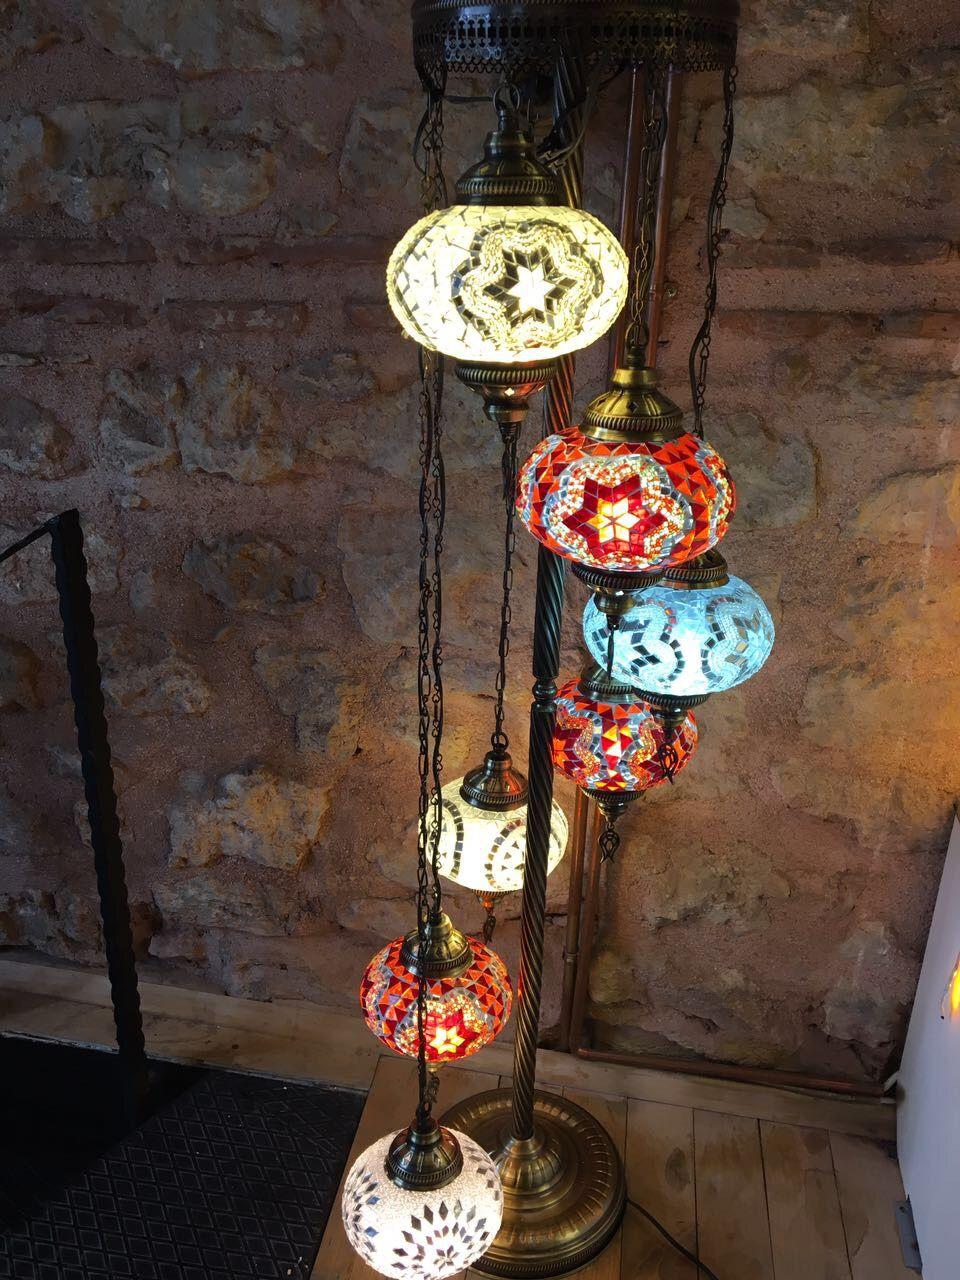 HANDMADE TURKISH MOSAIC FLOOR LAMP, 7 LAMPS, MULTI - COLOR | MOSAIC ...